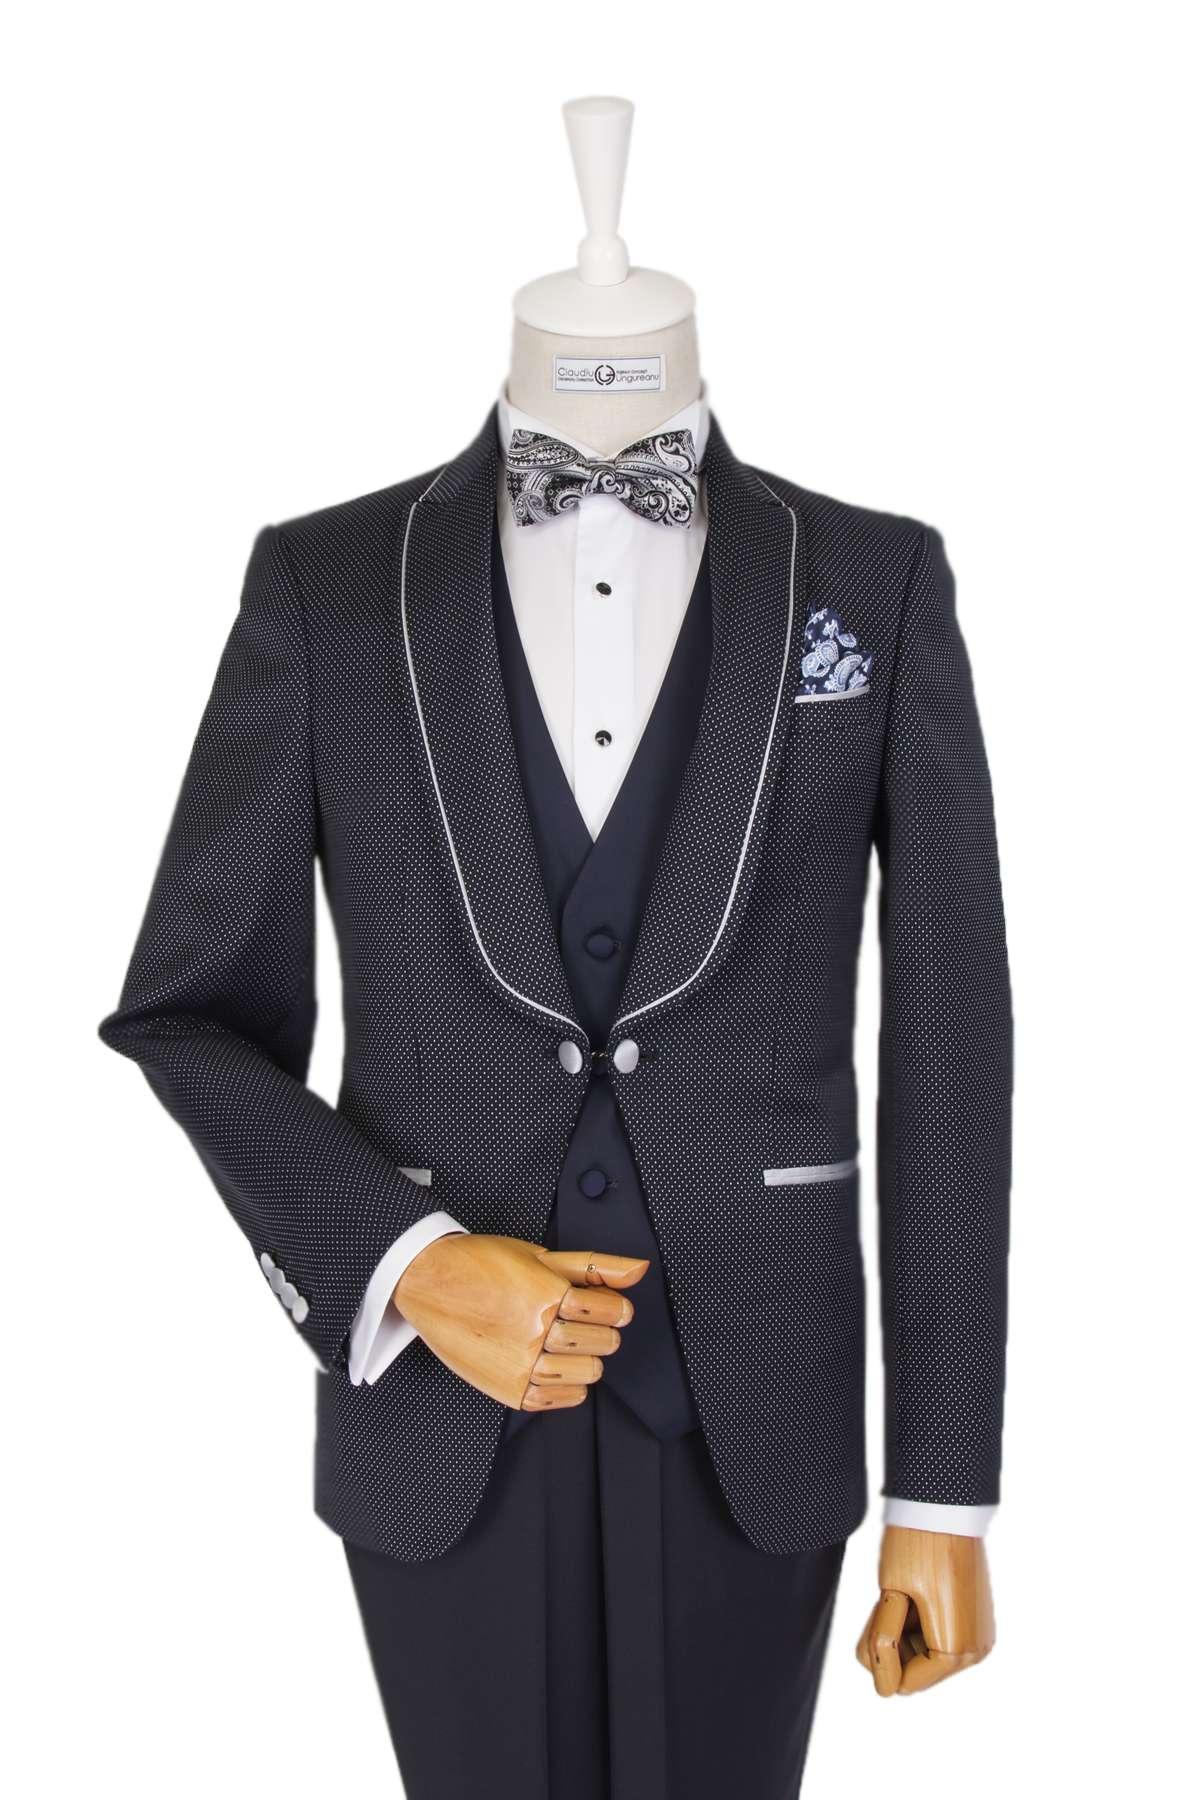 Bespoke Classic Suit - Dark Gray Reinterpretat